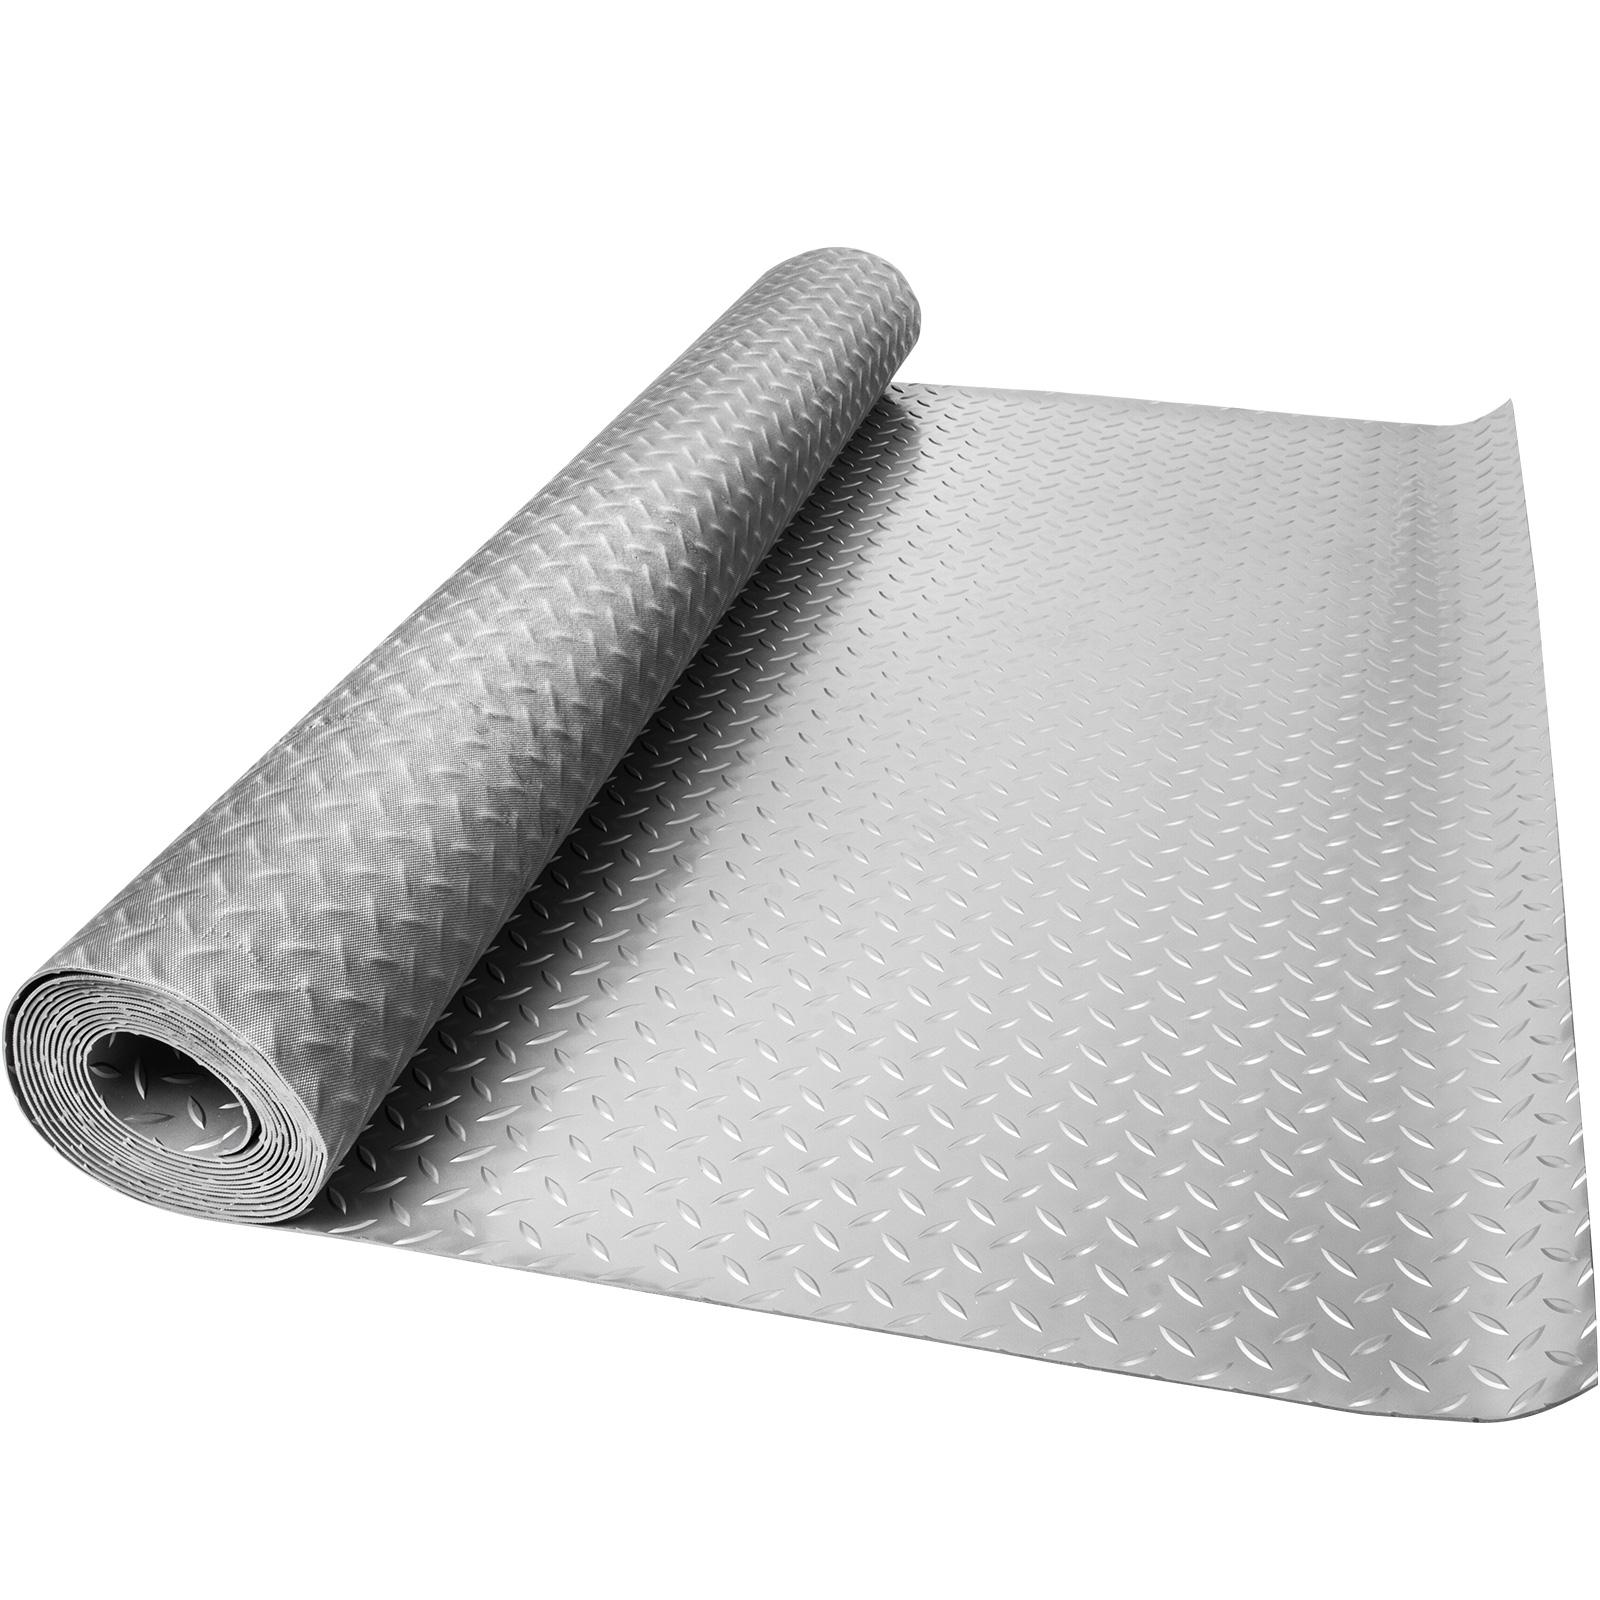 thumbnail 95 - Garage Flooring Mat Roll Car Trailer Floor Covering 1.1m Width Gym Floor Roll